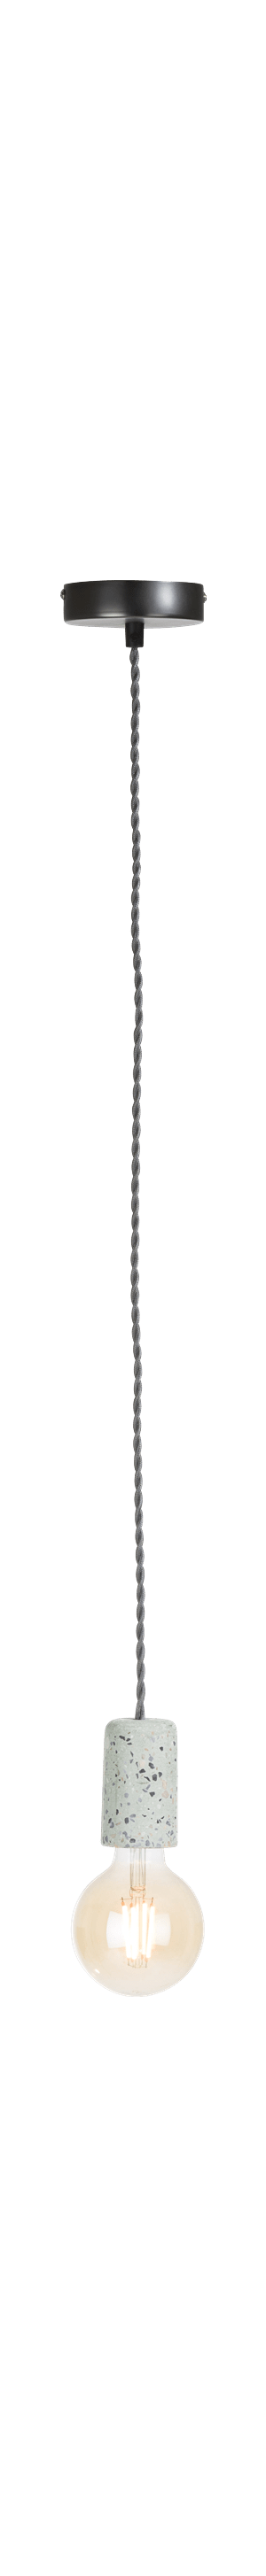 terrazza, hanglamp 1-lamp e27